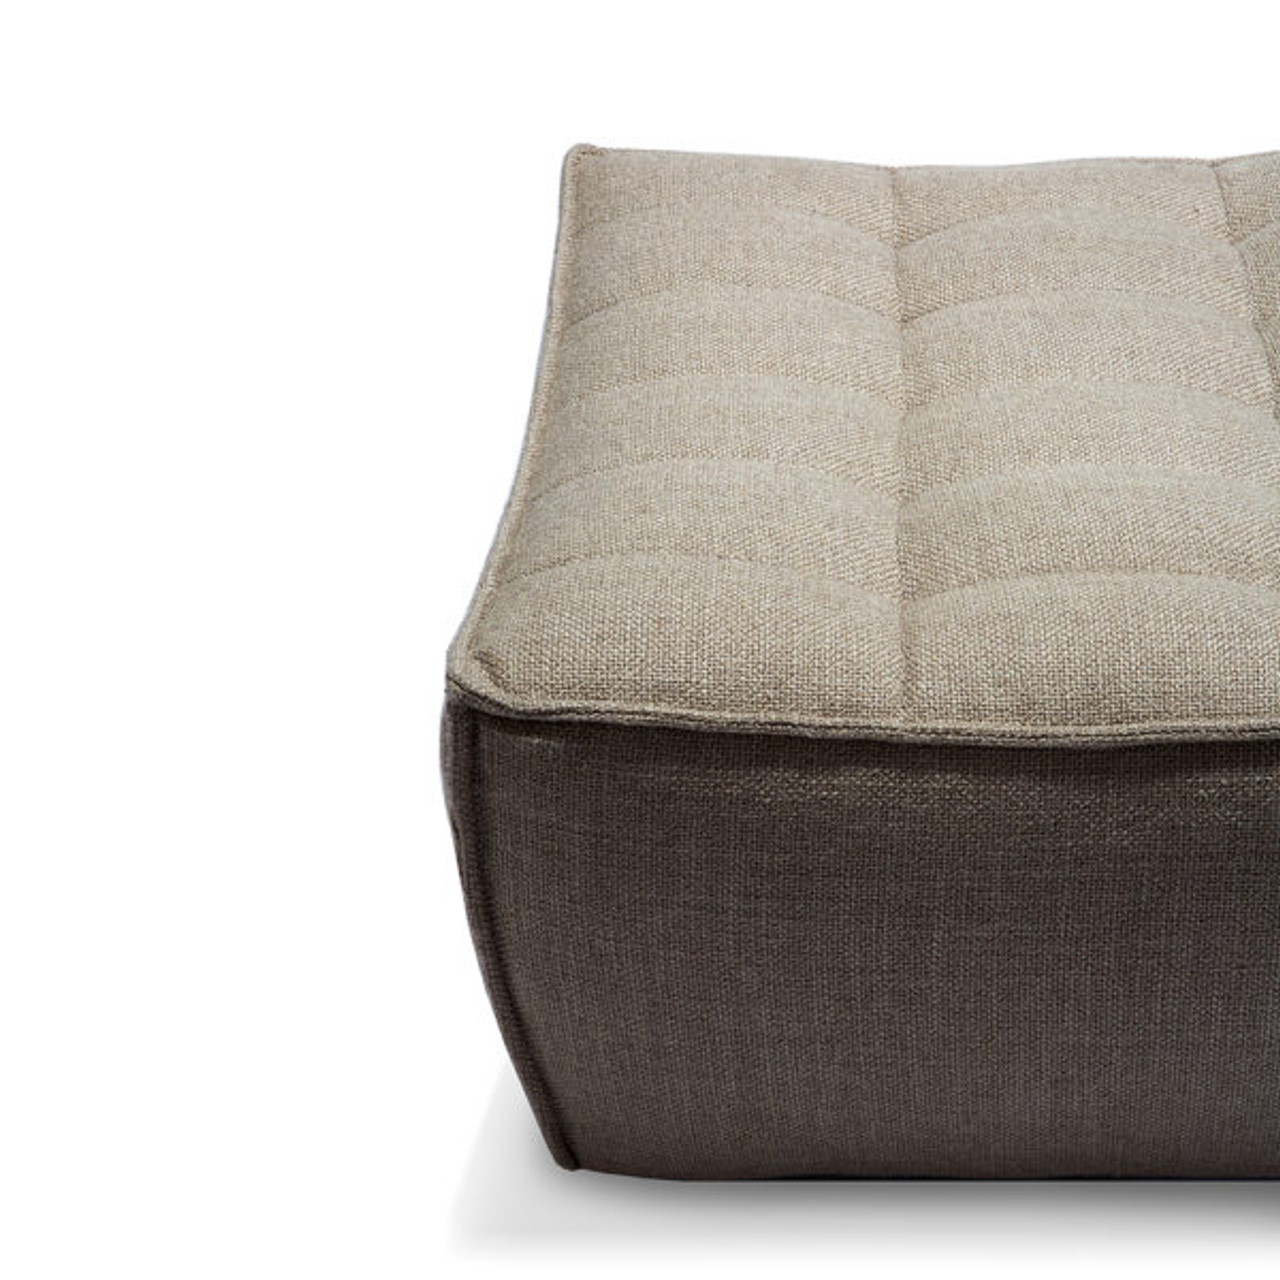 Roset Modular Sectional - Footstool Ottoman